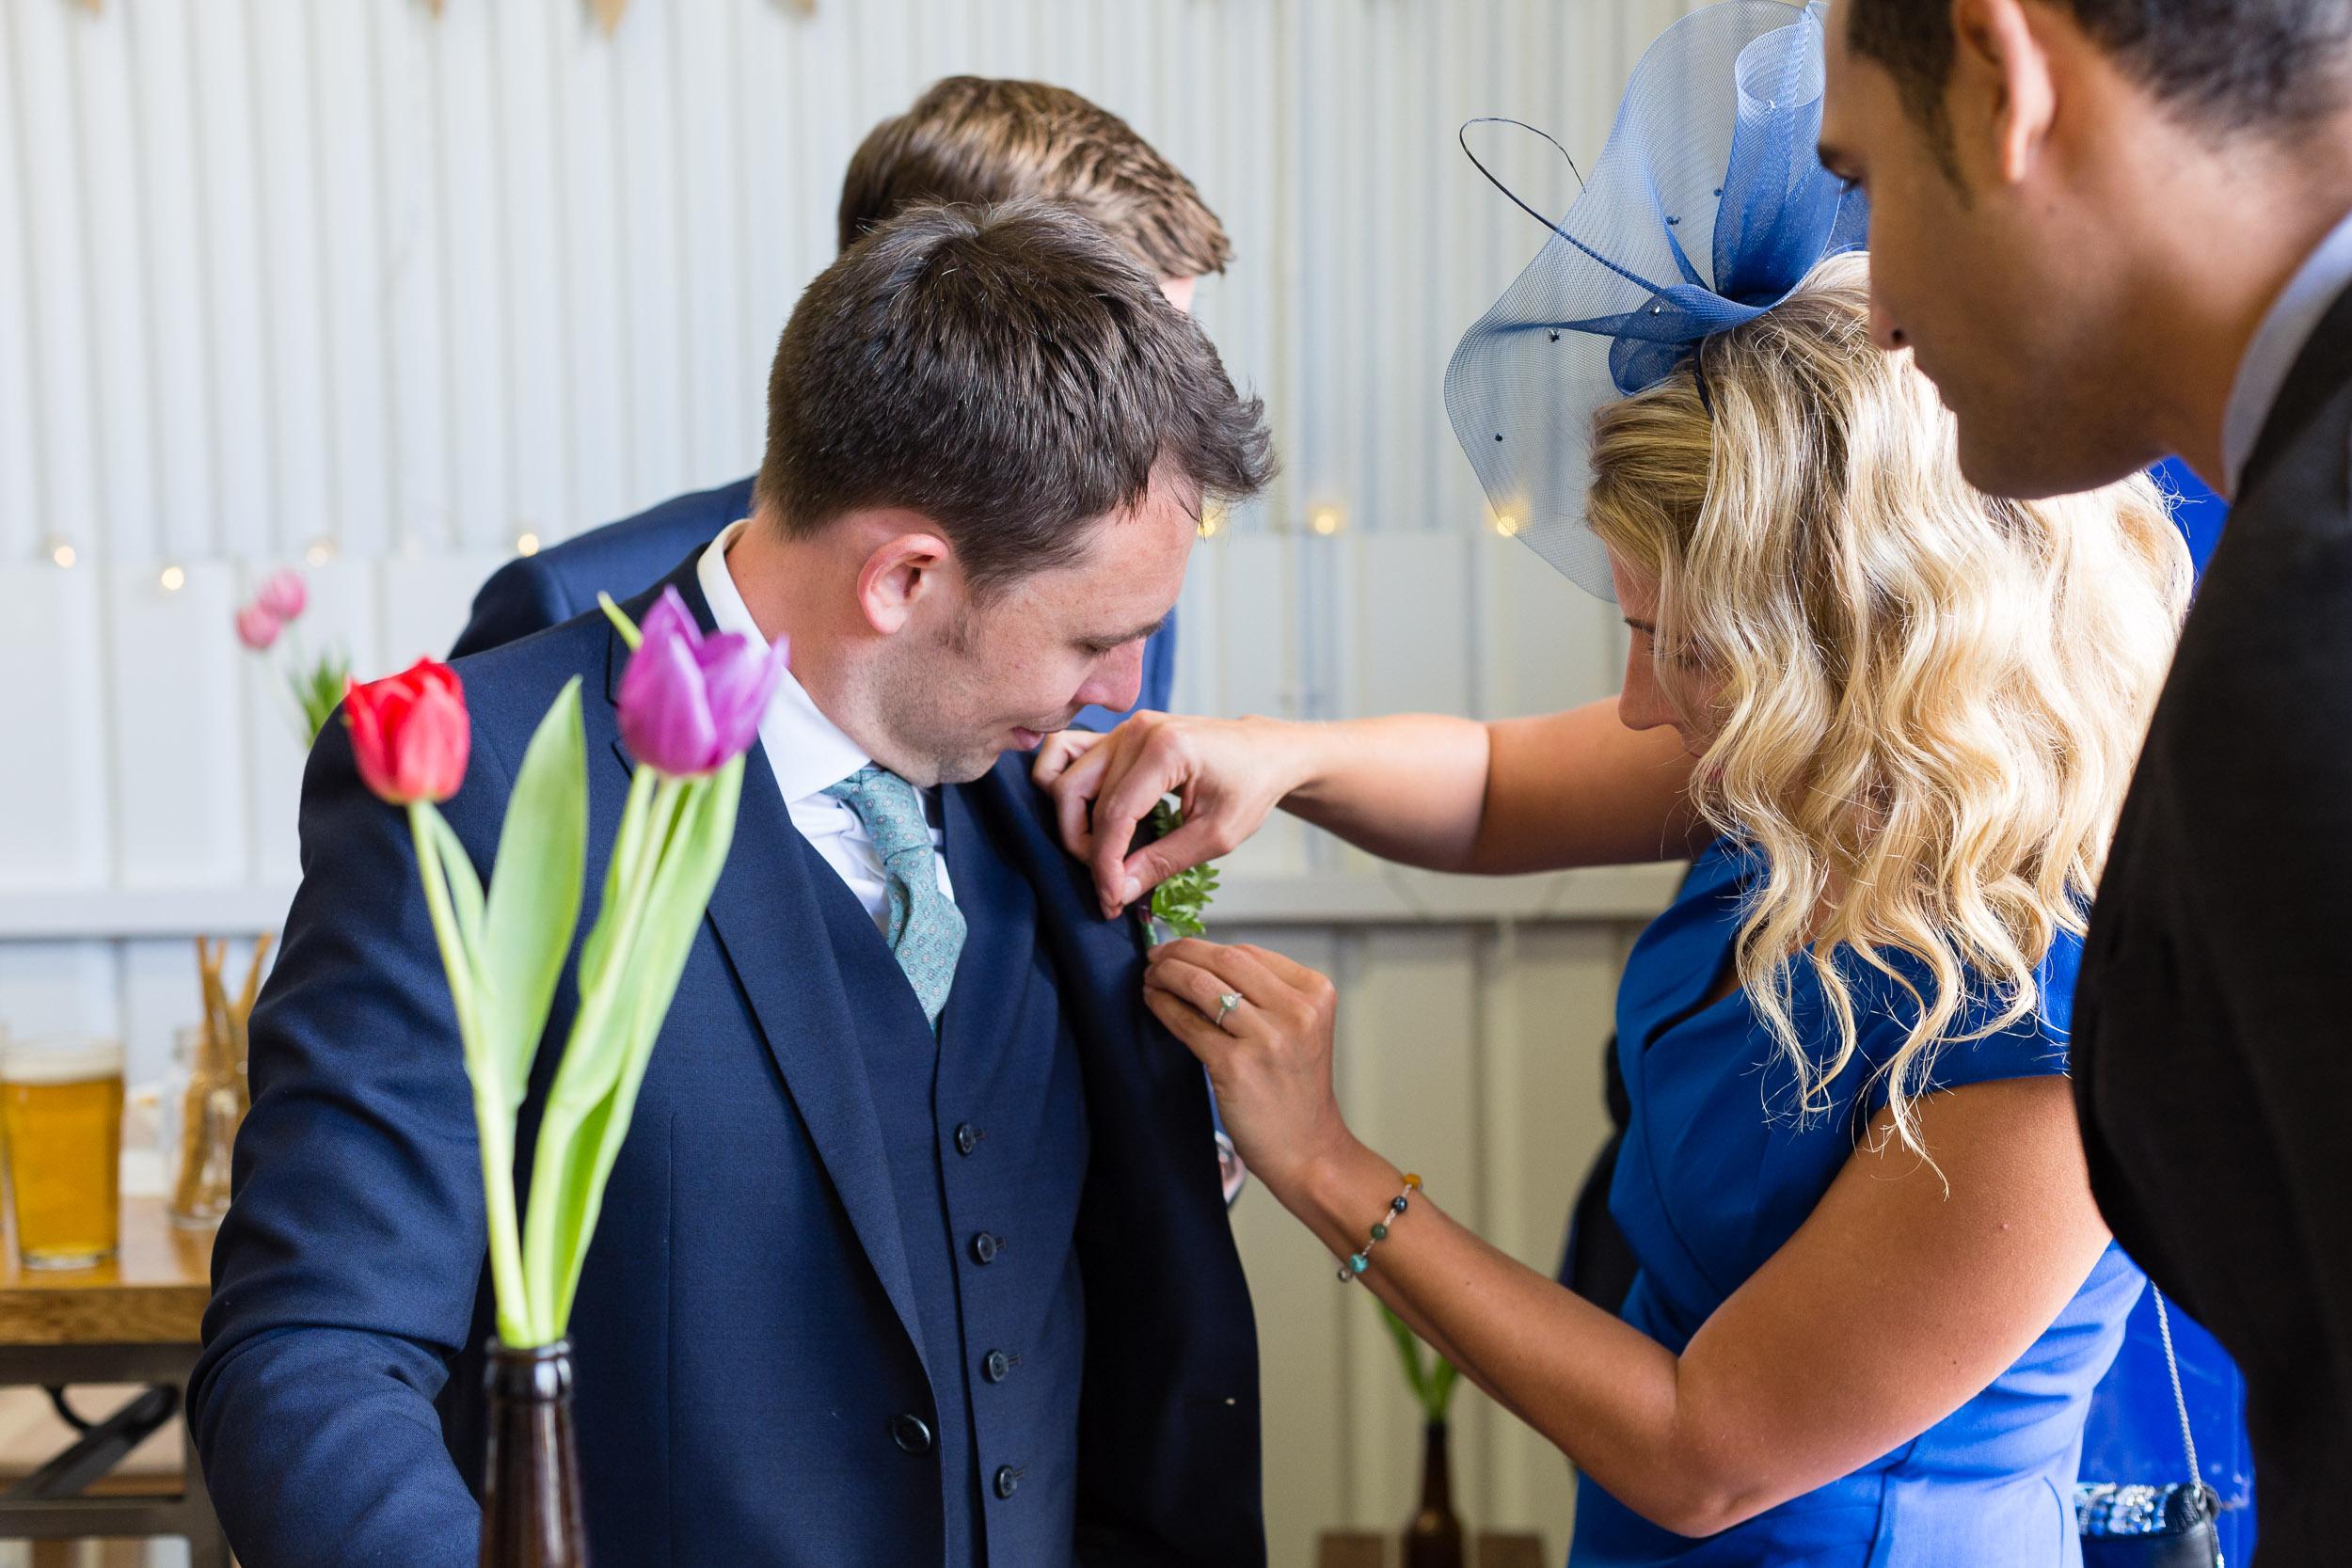 brockwell-lido-brixton-herne-hill-wedding-009.jpg